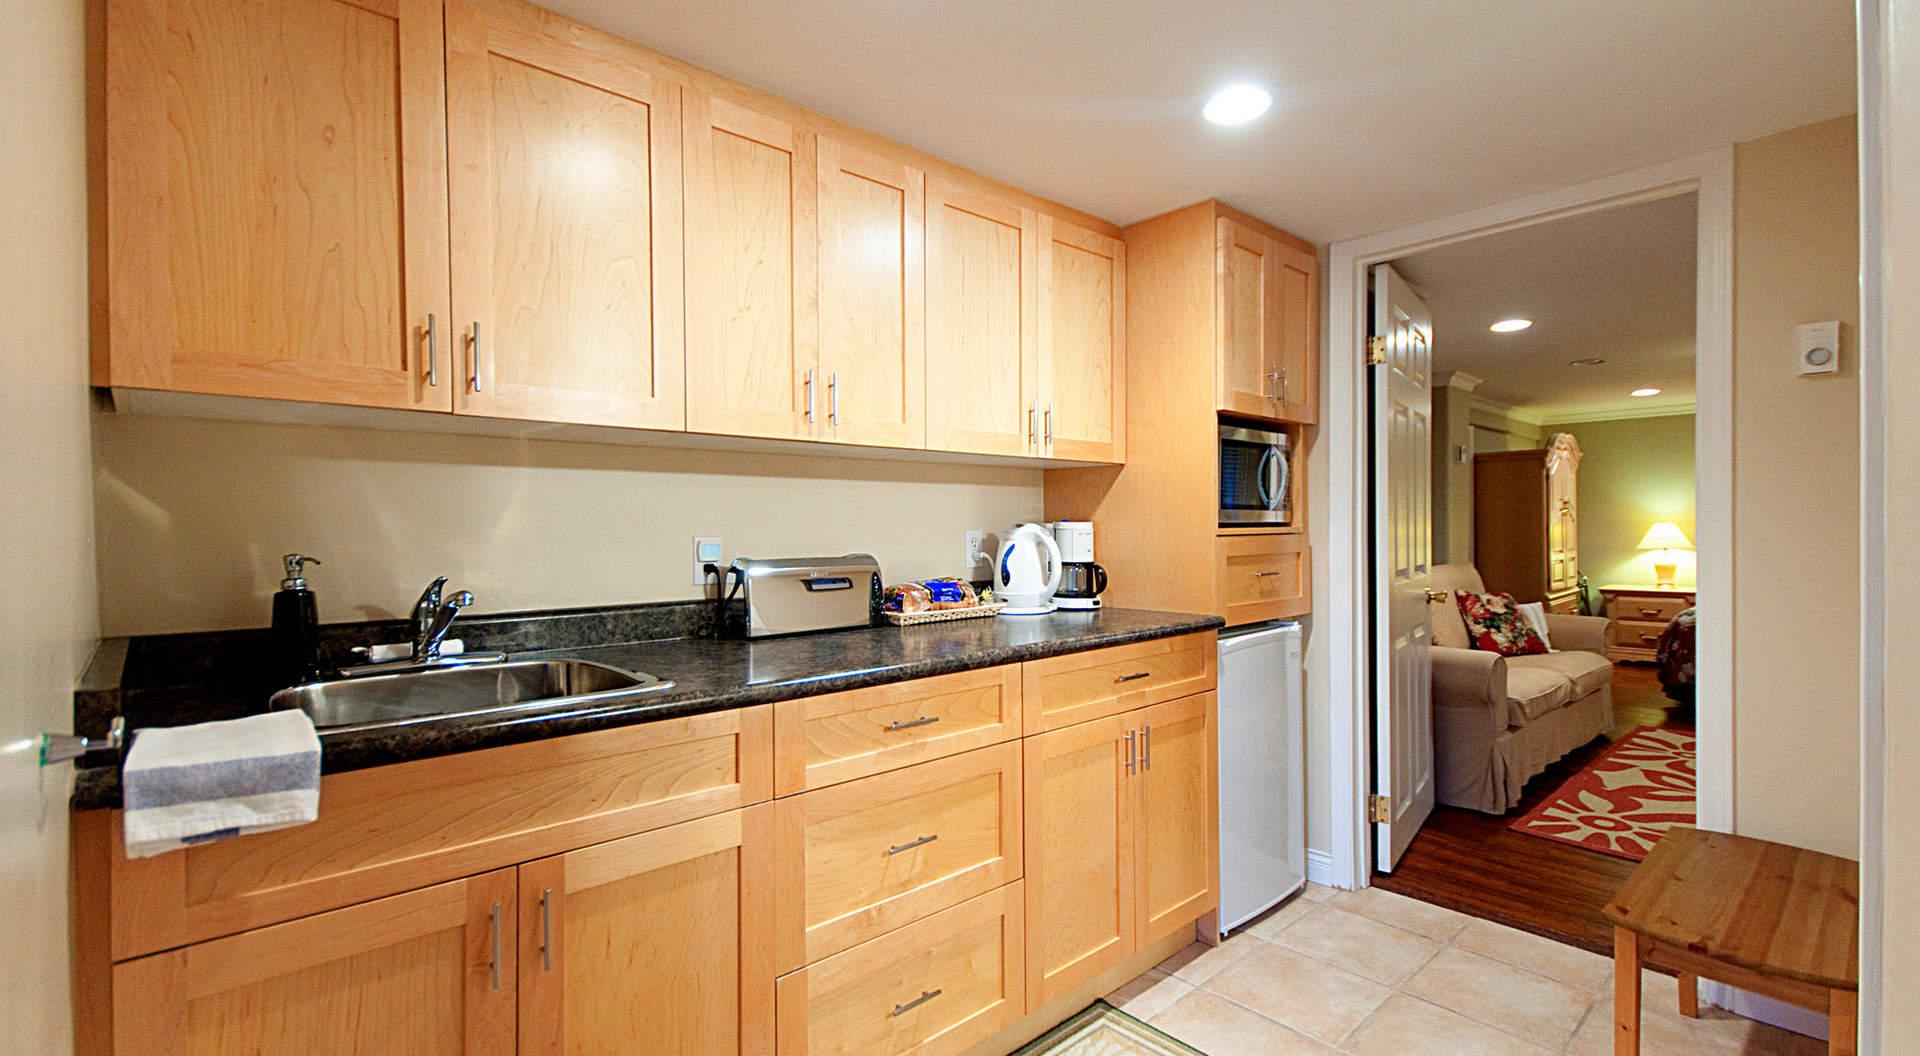 lg kitchen suite end cabinet 2913 west 28th avenue 西温哥华住房与地产 加拿大不列颠哥伦比亚省 com top of page 小厨房 玉兰套房